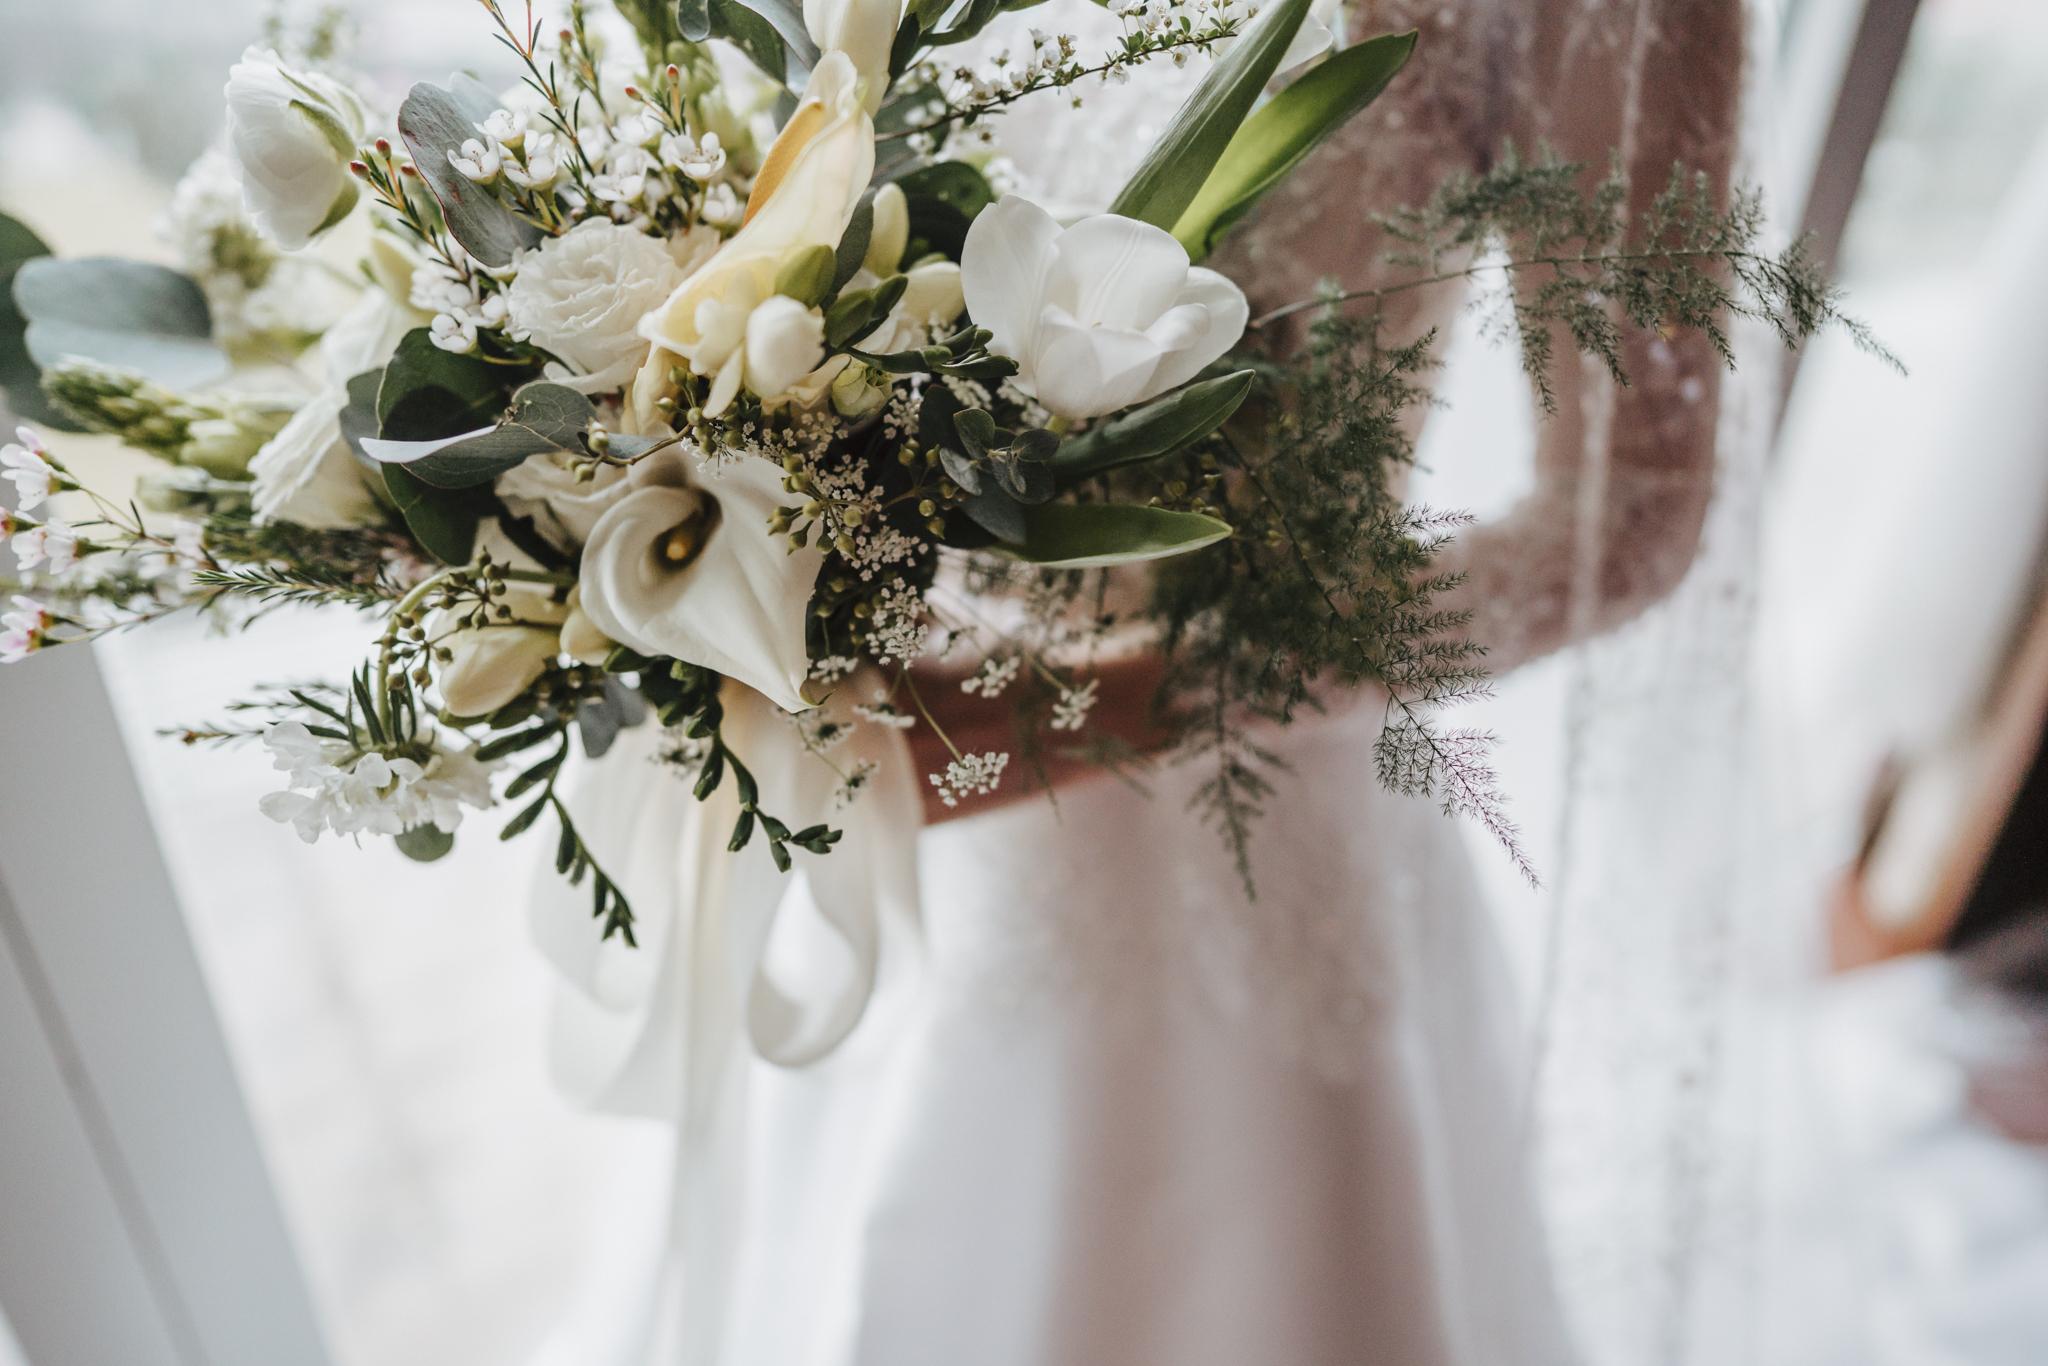 JWMarriott Ha Noi Intimate Wedding of Trang Hi well captured by Hipster Wedding Vietnam Wedding Photographer-35666.jpg